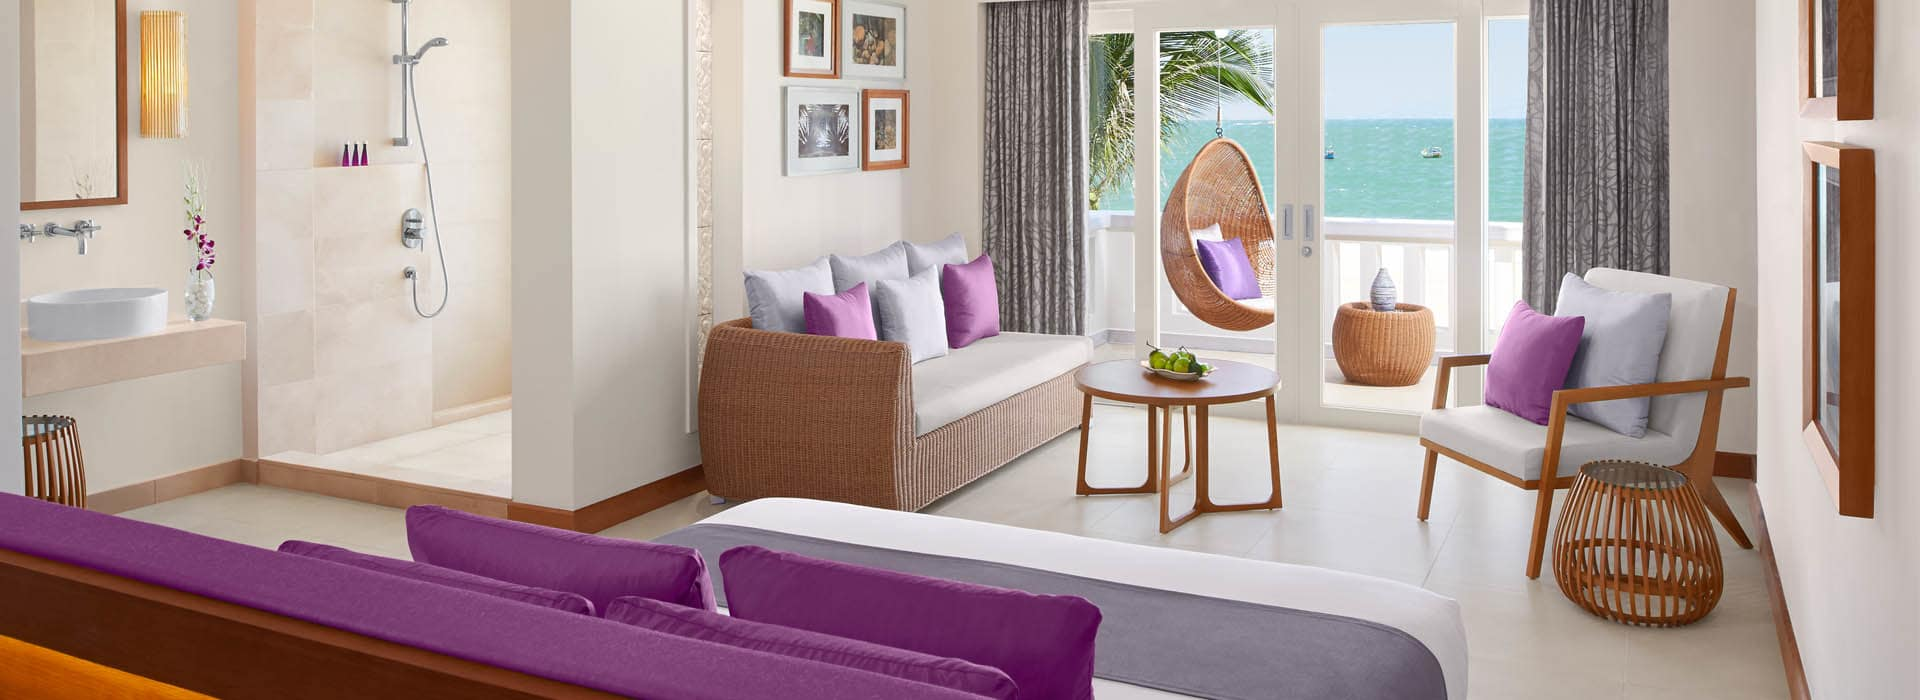 Ocean suite at a Resort in Quy Nhon